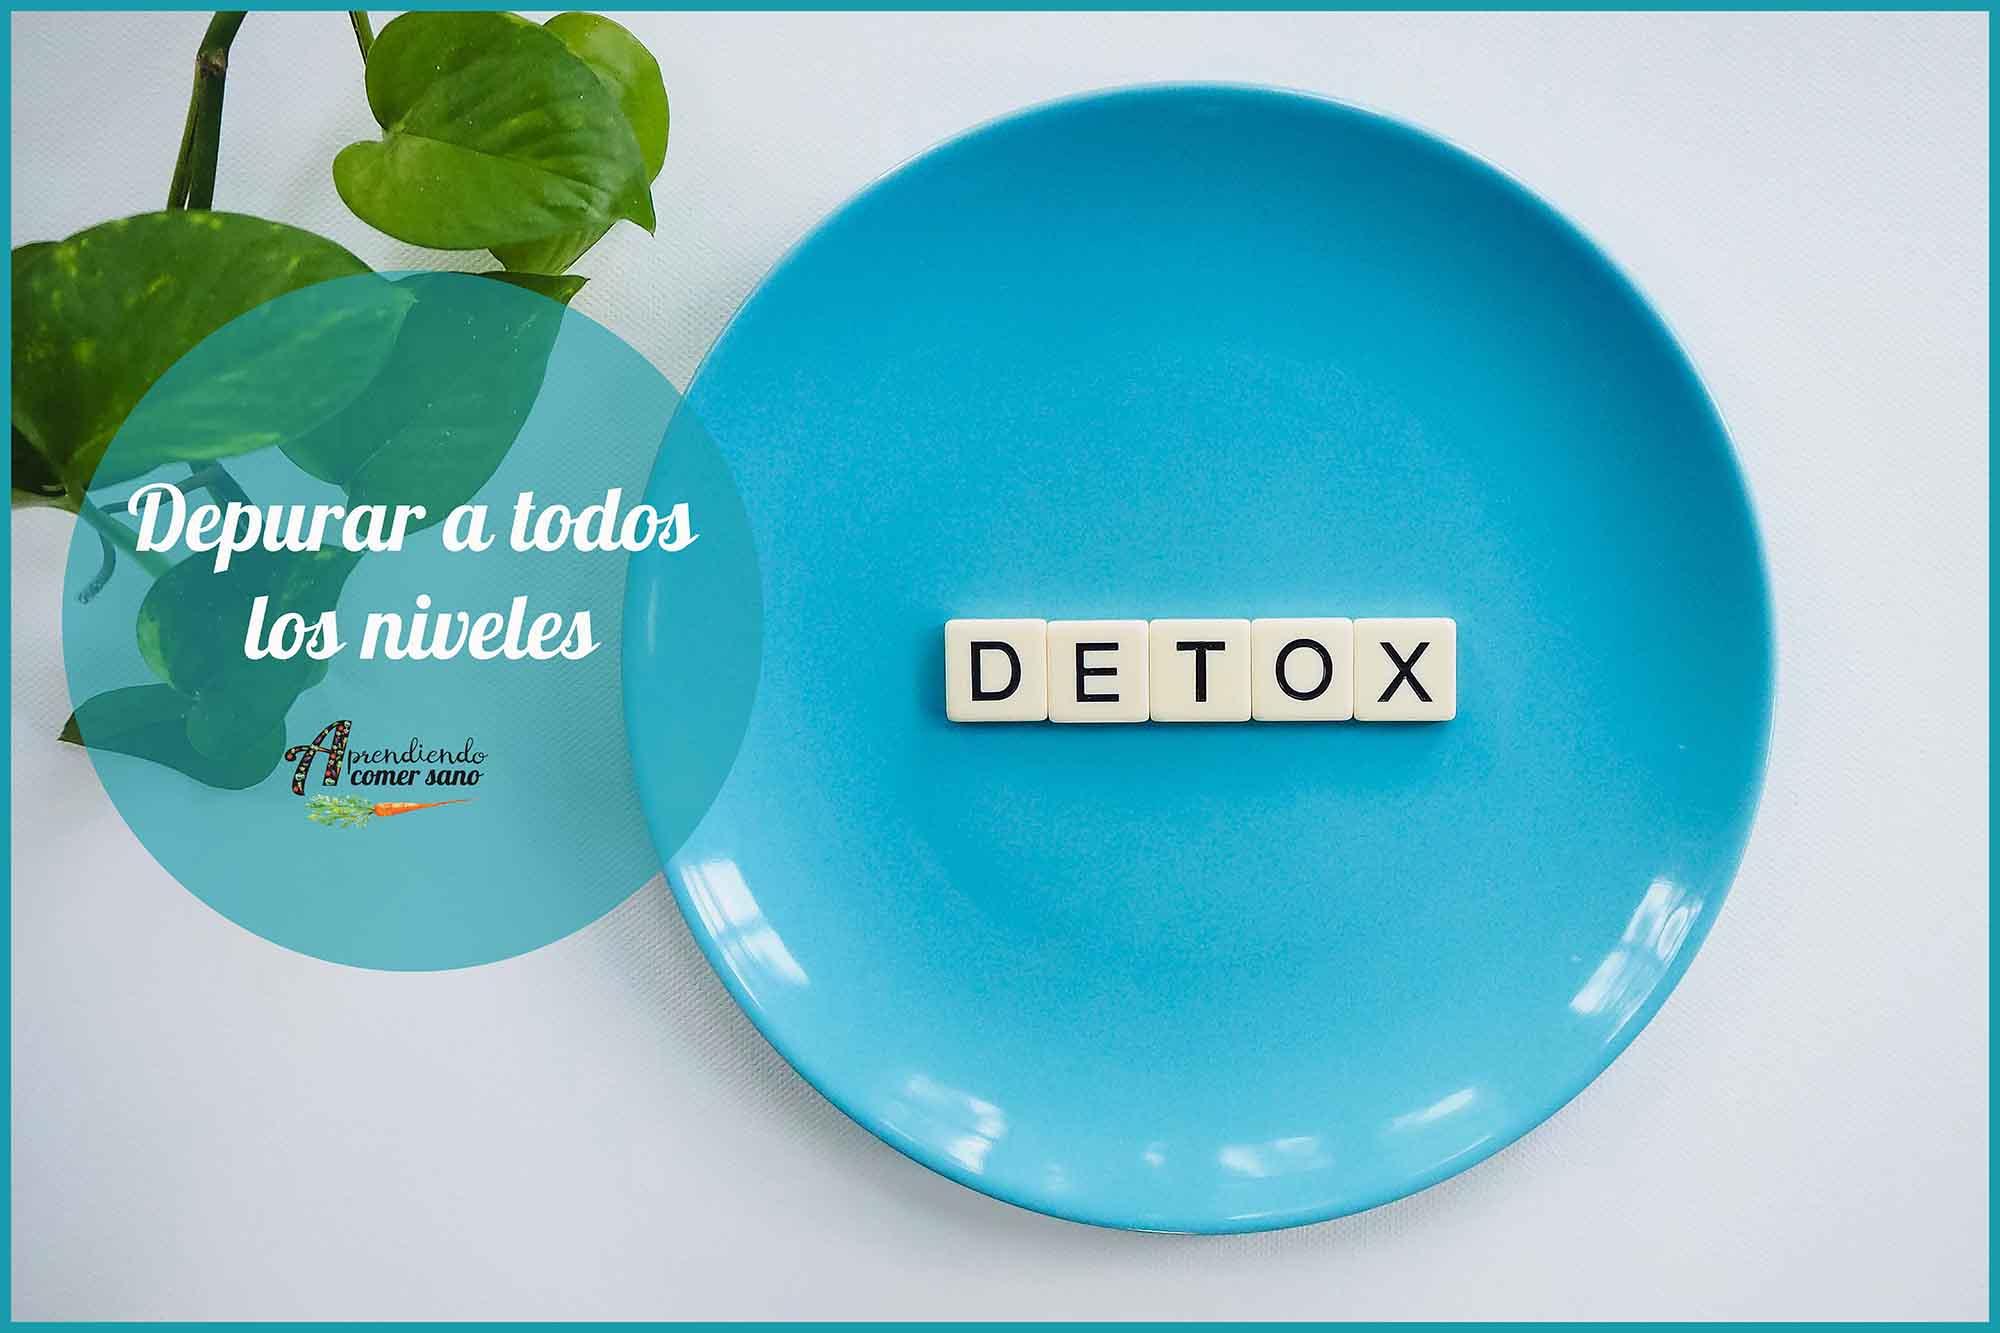 detox depurar